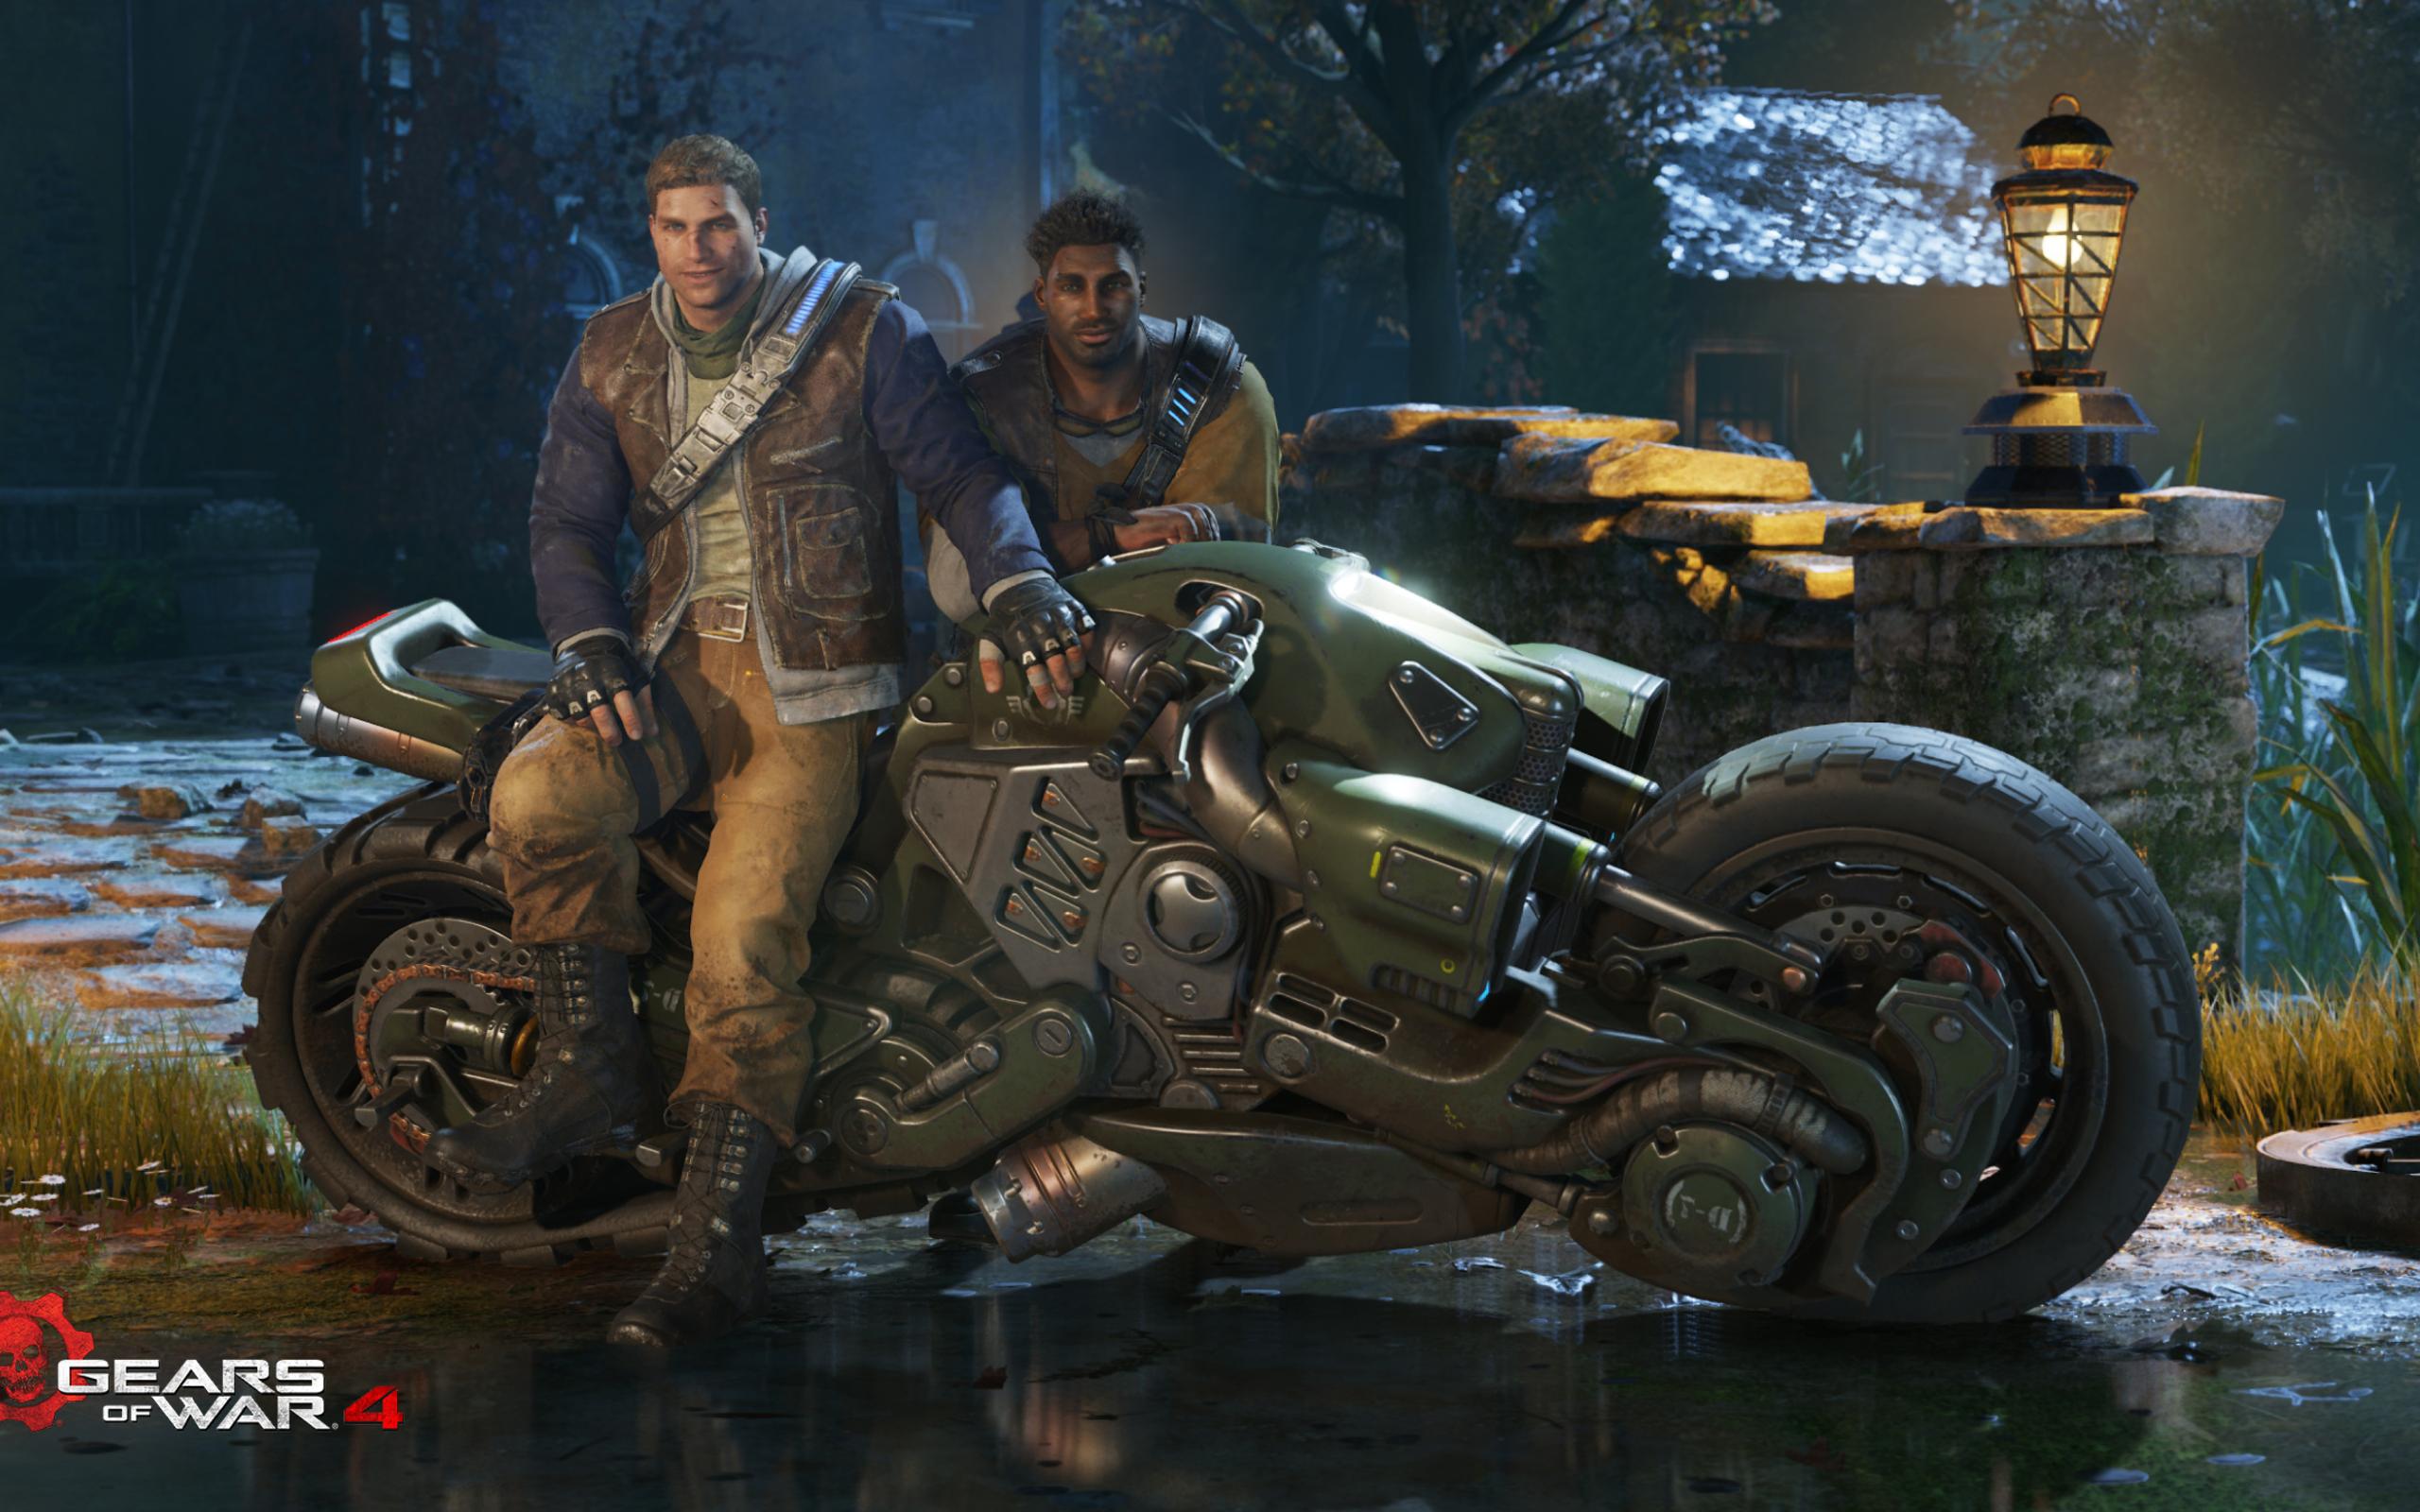 Gears Of War 4 2016 Video Game 4k Hd Desktop Wallpaper For: 2560x1600 Gears Of War 4 2016 Game 2560x1600 Resolution HD